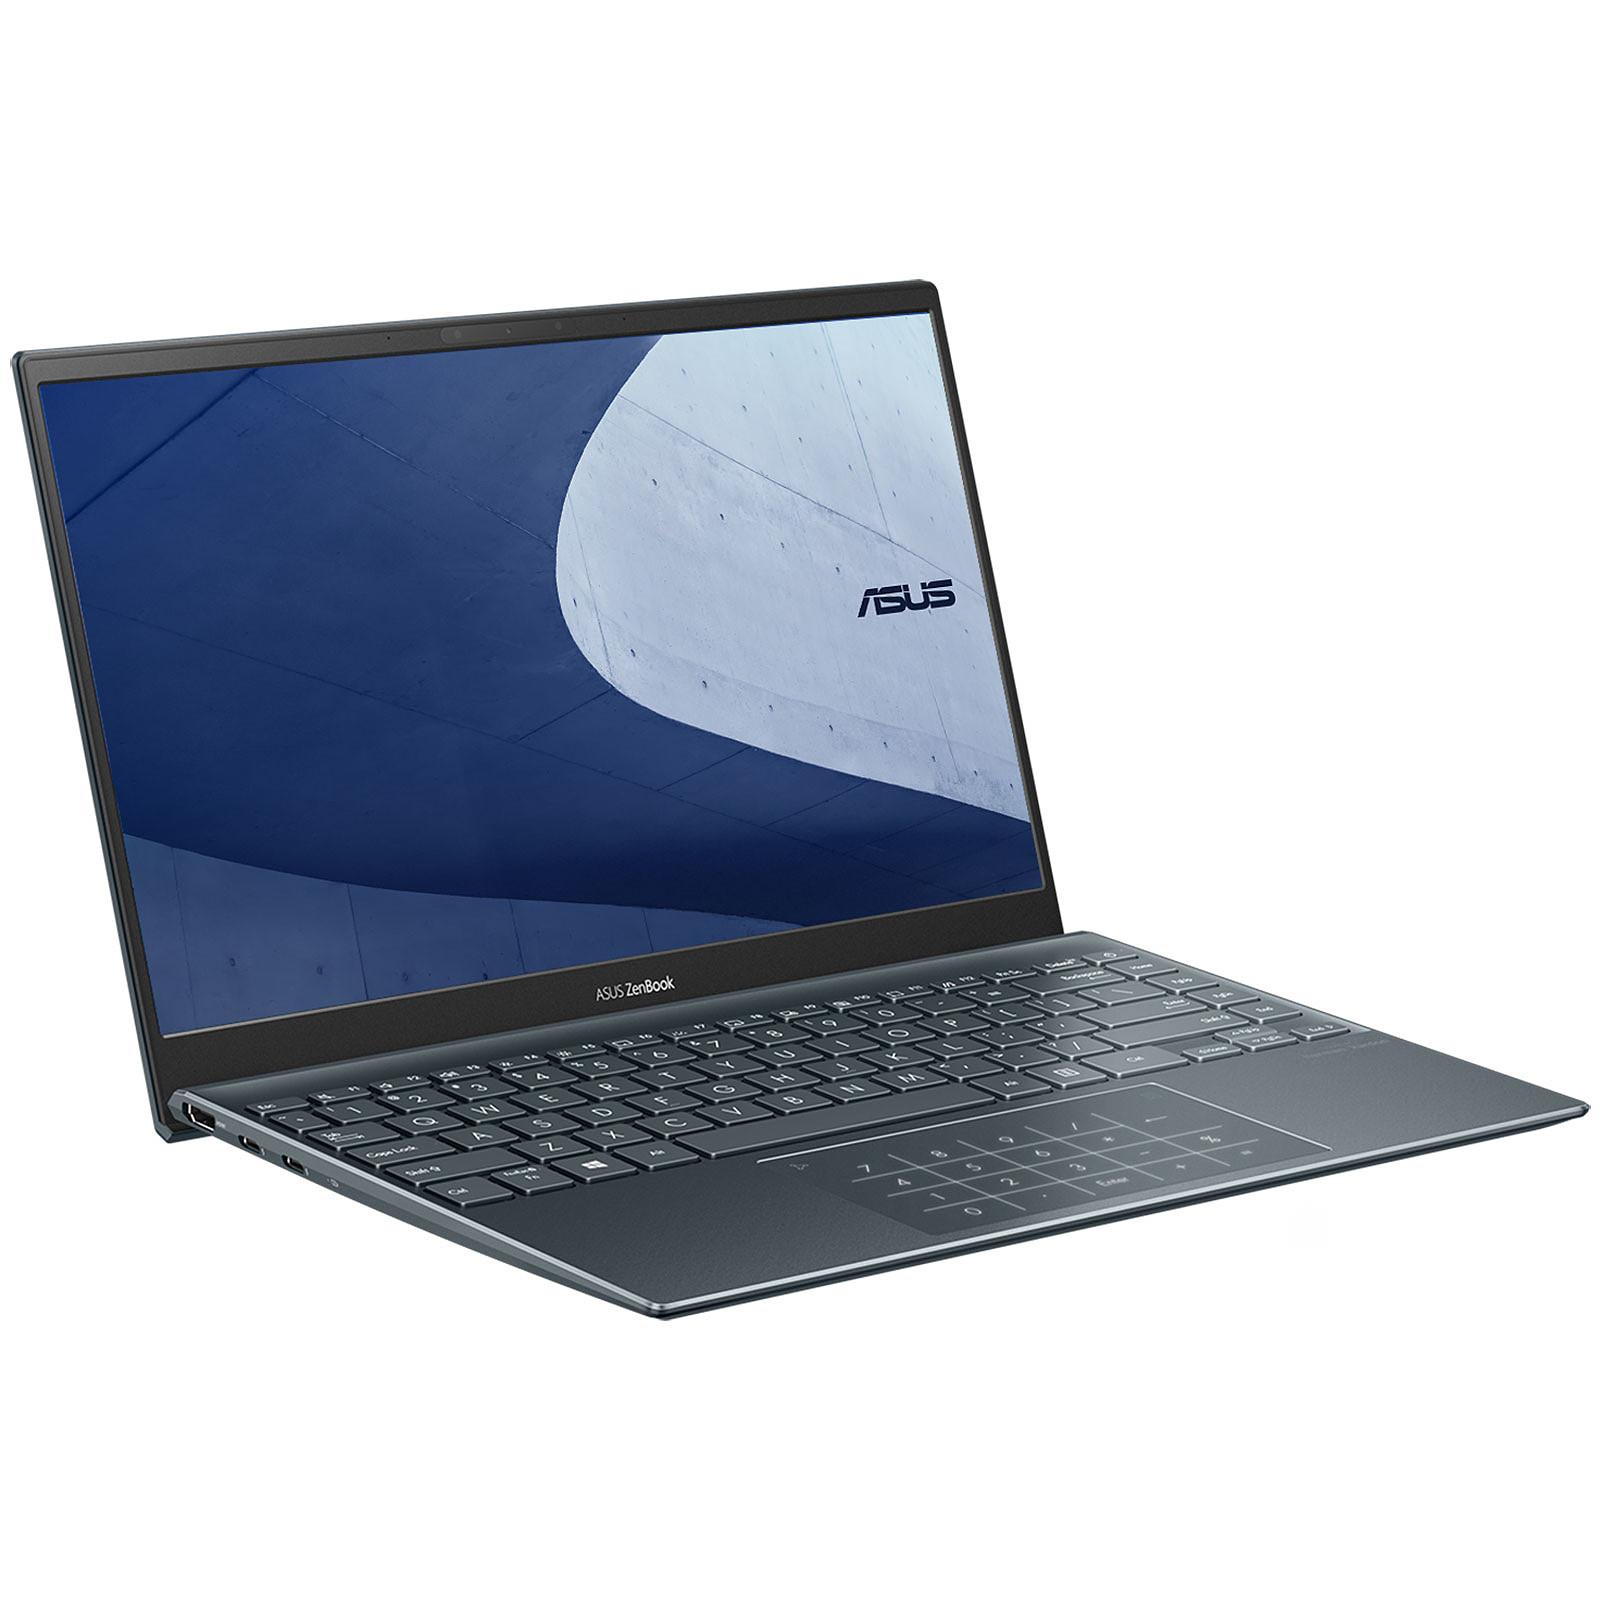 ASUS Zenbook 14 BX425JA-BM122R avec NumPad